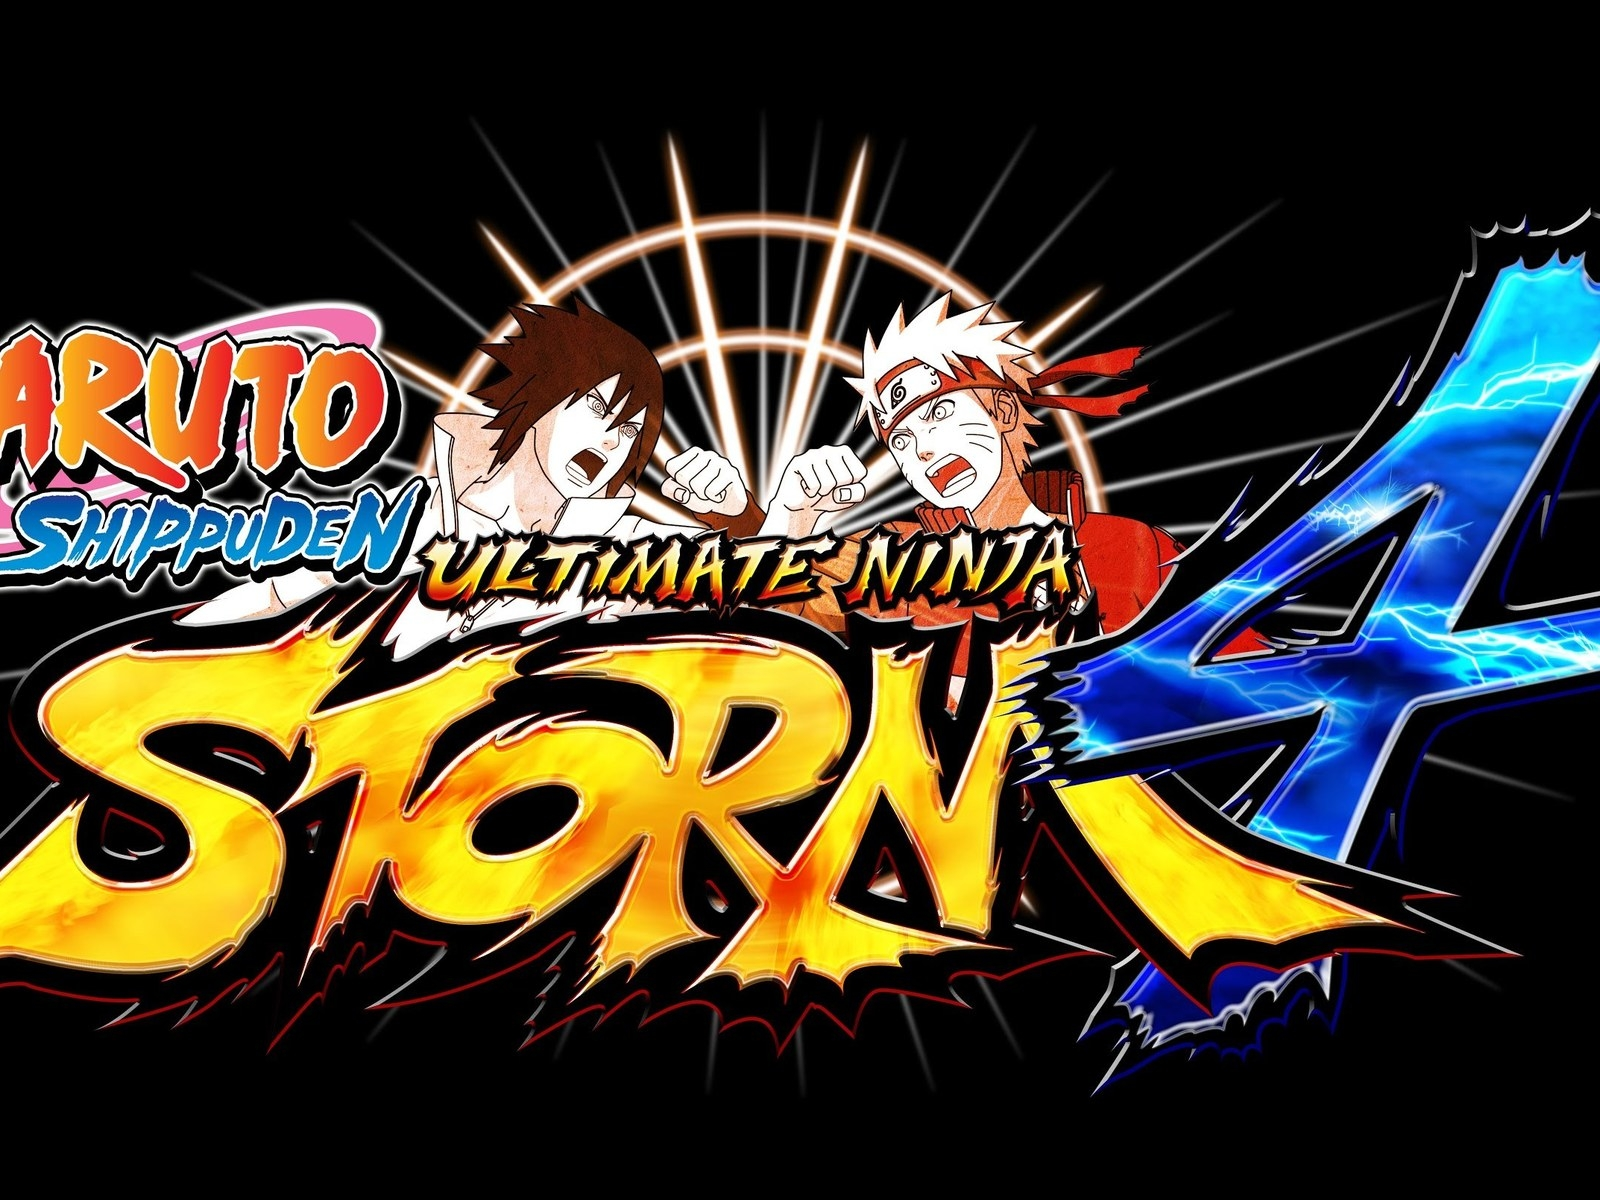 Naruto Shippuden Ultimate Ninja Storm 4 Poster 1600 X 1200 Wallpaper